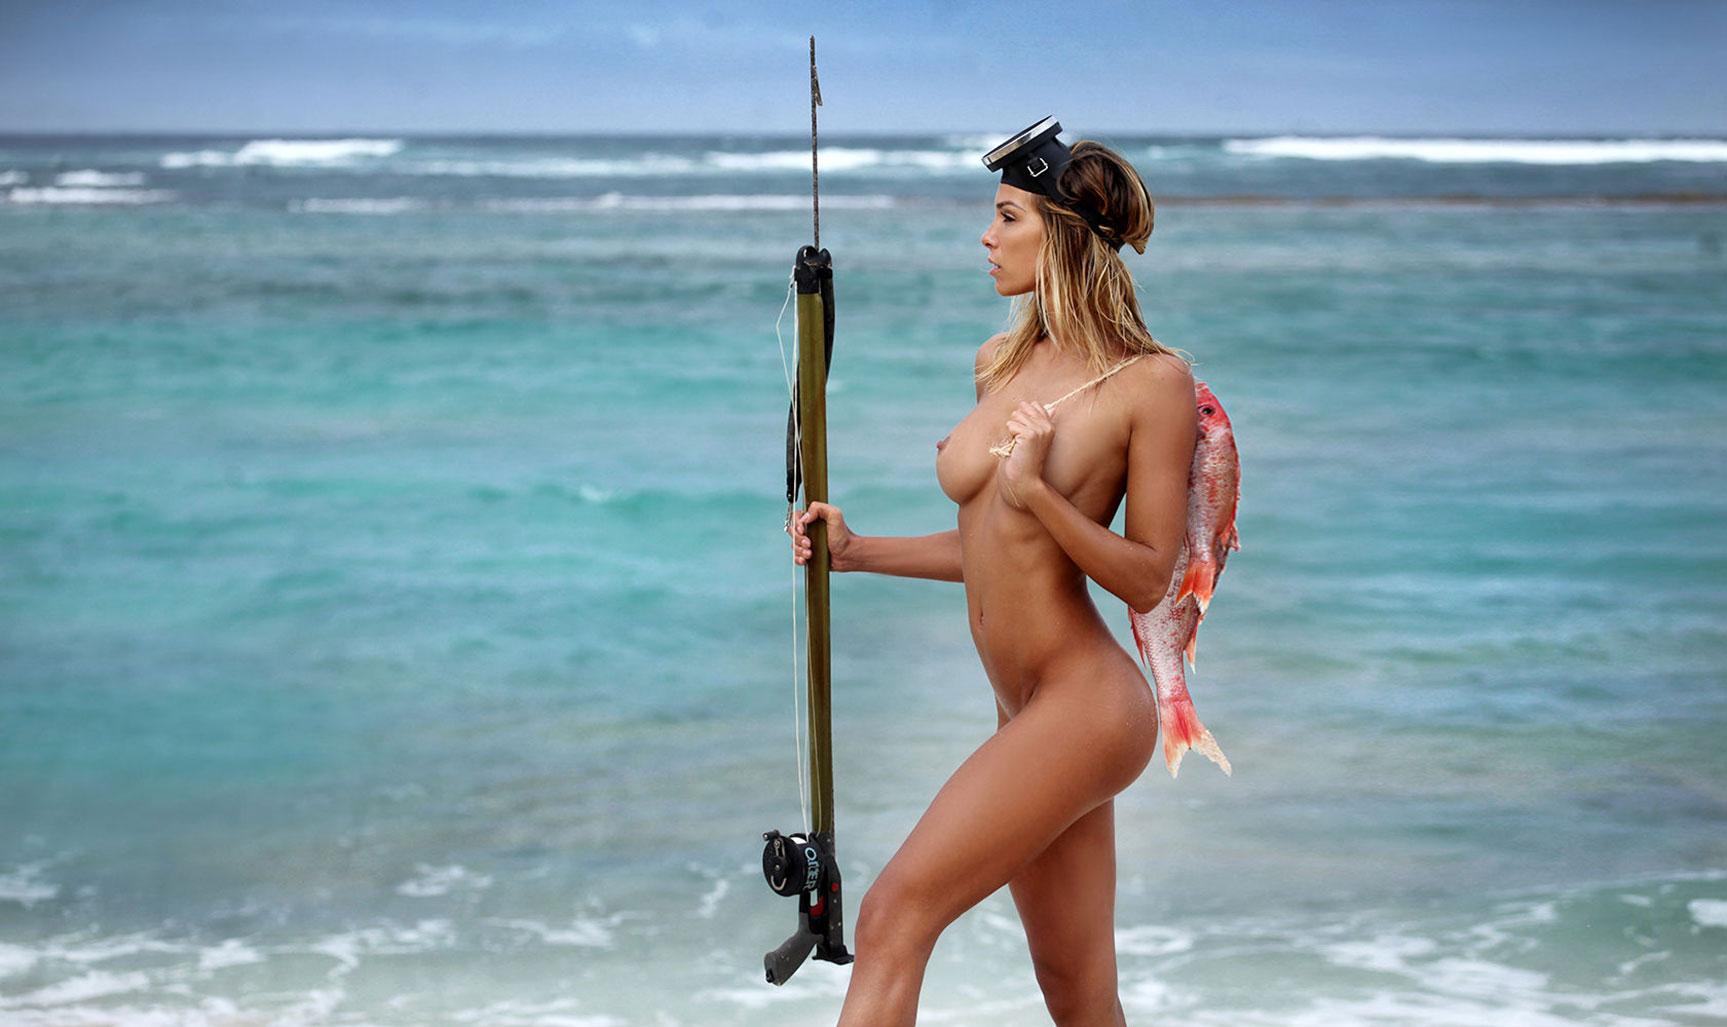 Рыбалка в Гваделупе / Christy Lacour Gianini nude by Sylvio Testa